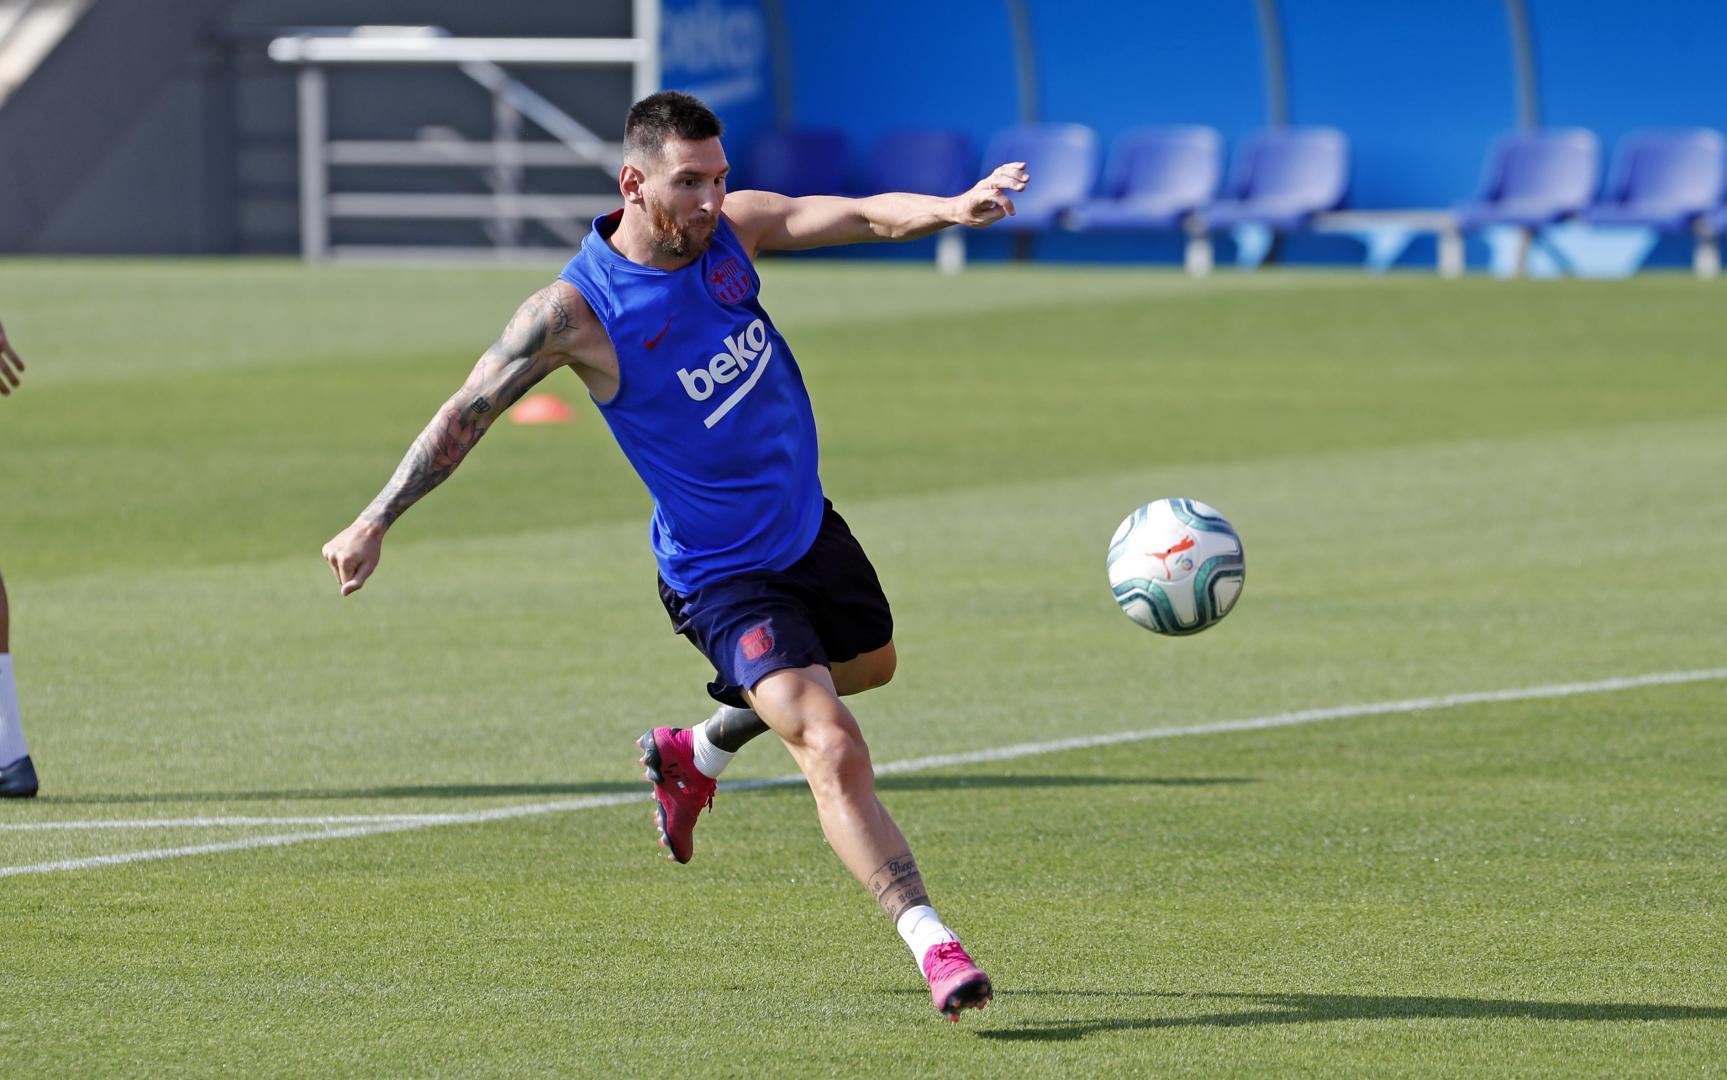 barcelona-بارسلونا-مهاجم-آرژانتین